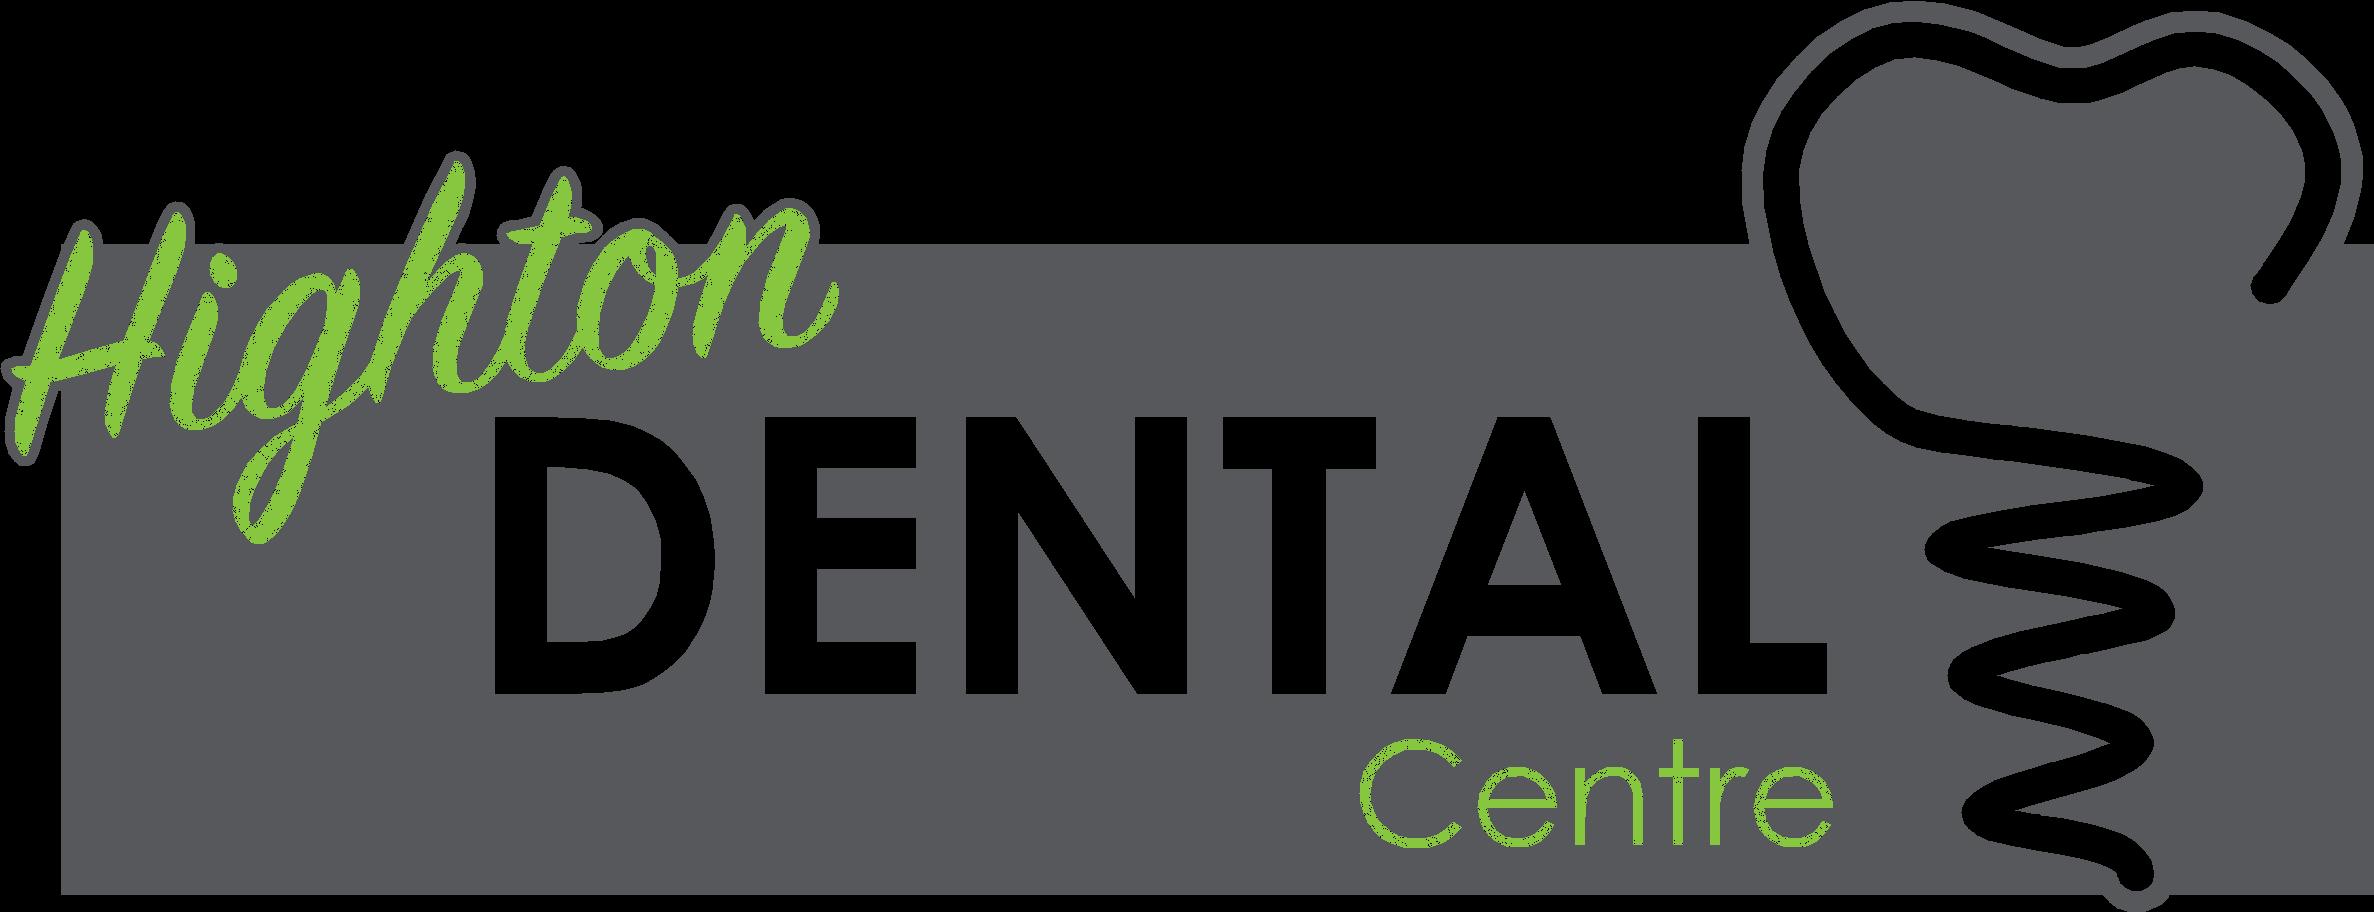 logo for Highton Dental Centre Dentists